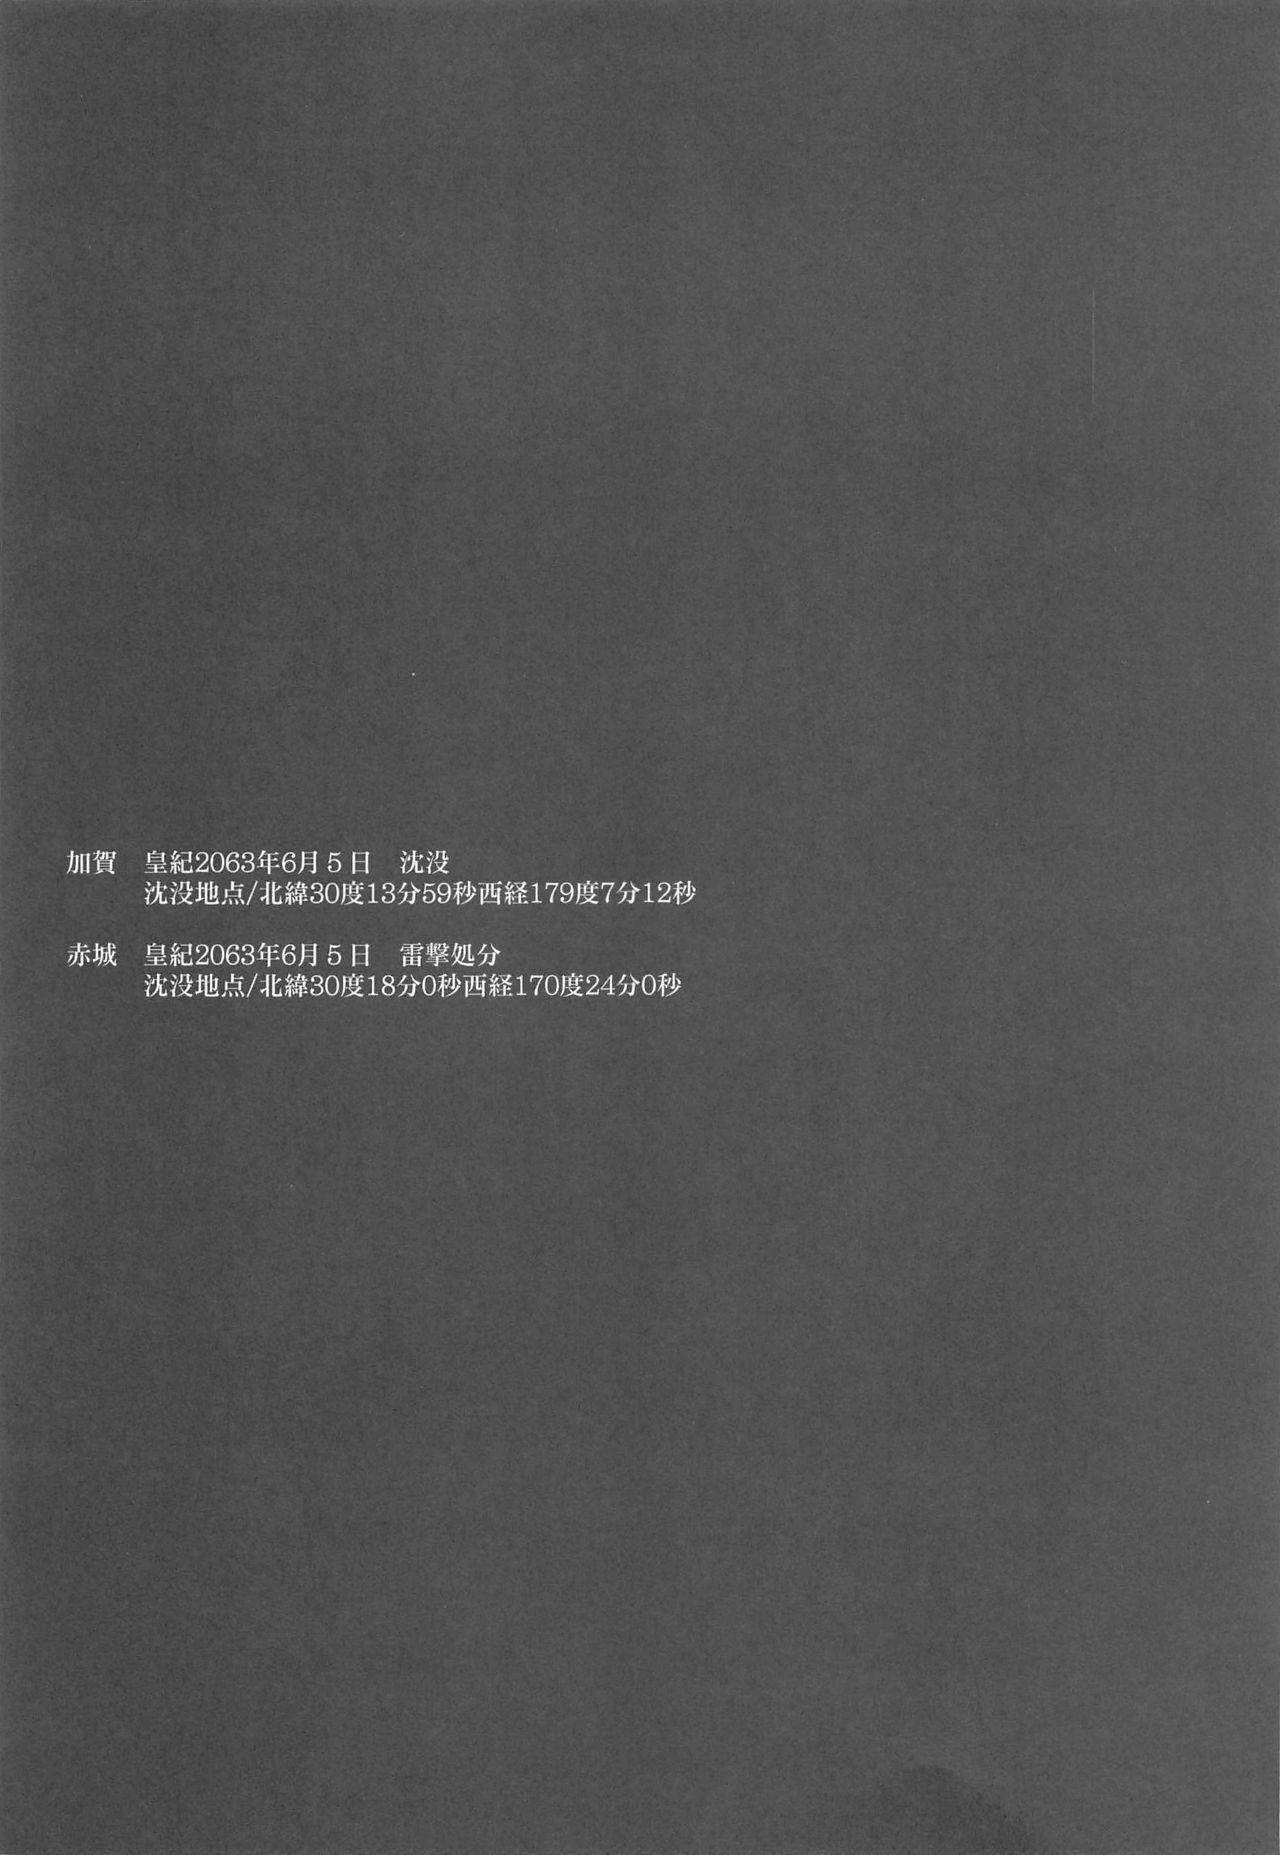 (C85) [Nise-Jyuusyofutei (Nakamura Takeshi)] Hokui 30-do 13-pun 59-byou Seikei 179-do 7-fun 12-byou (Kantai Collection -KanColle-) 25